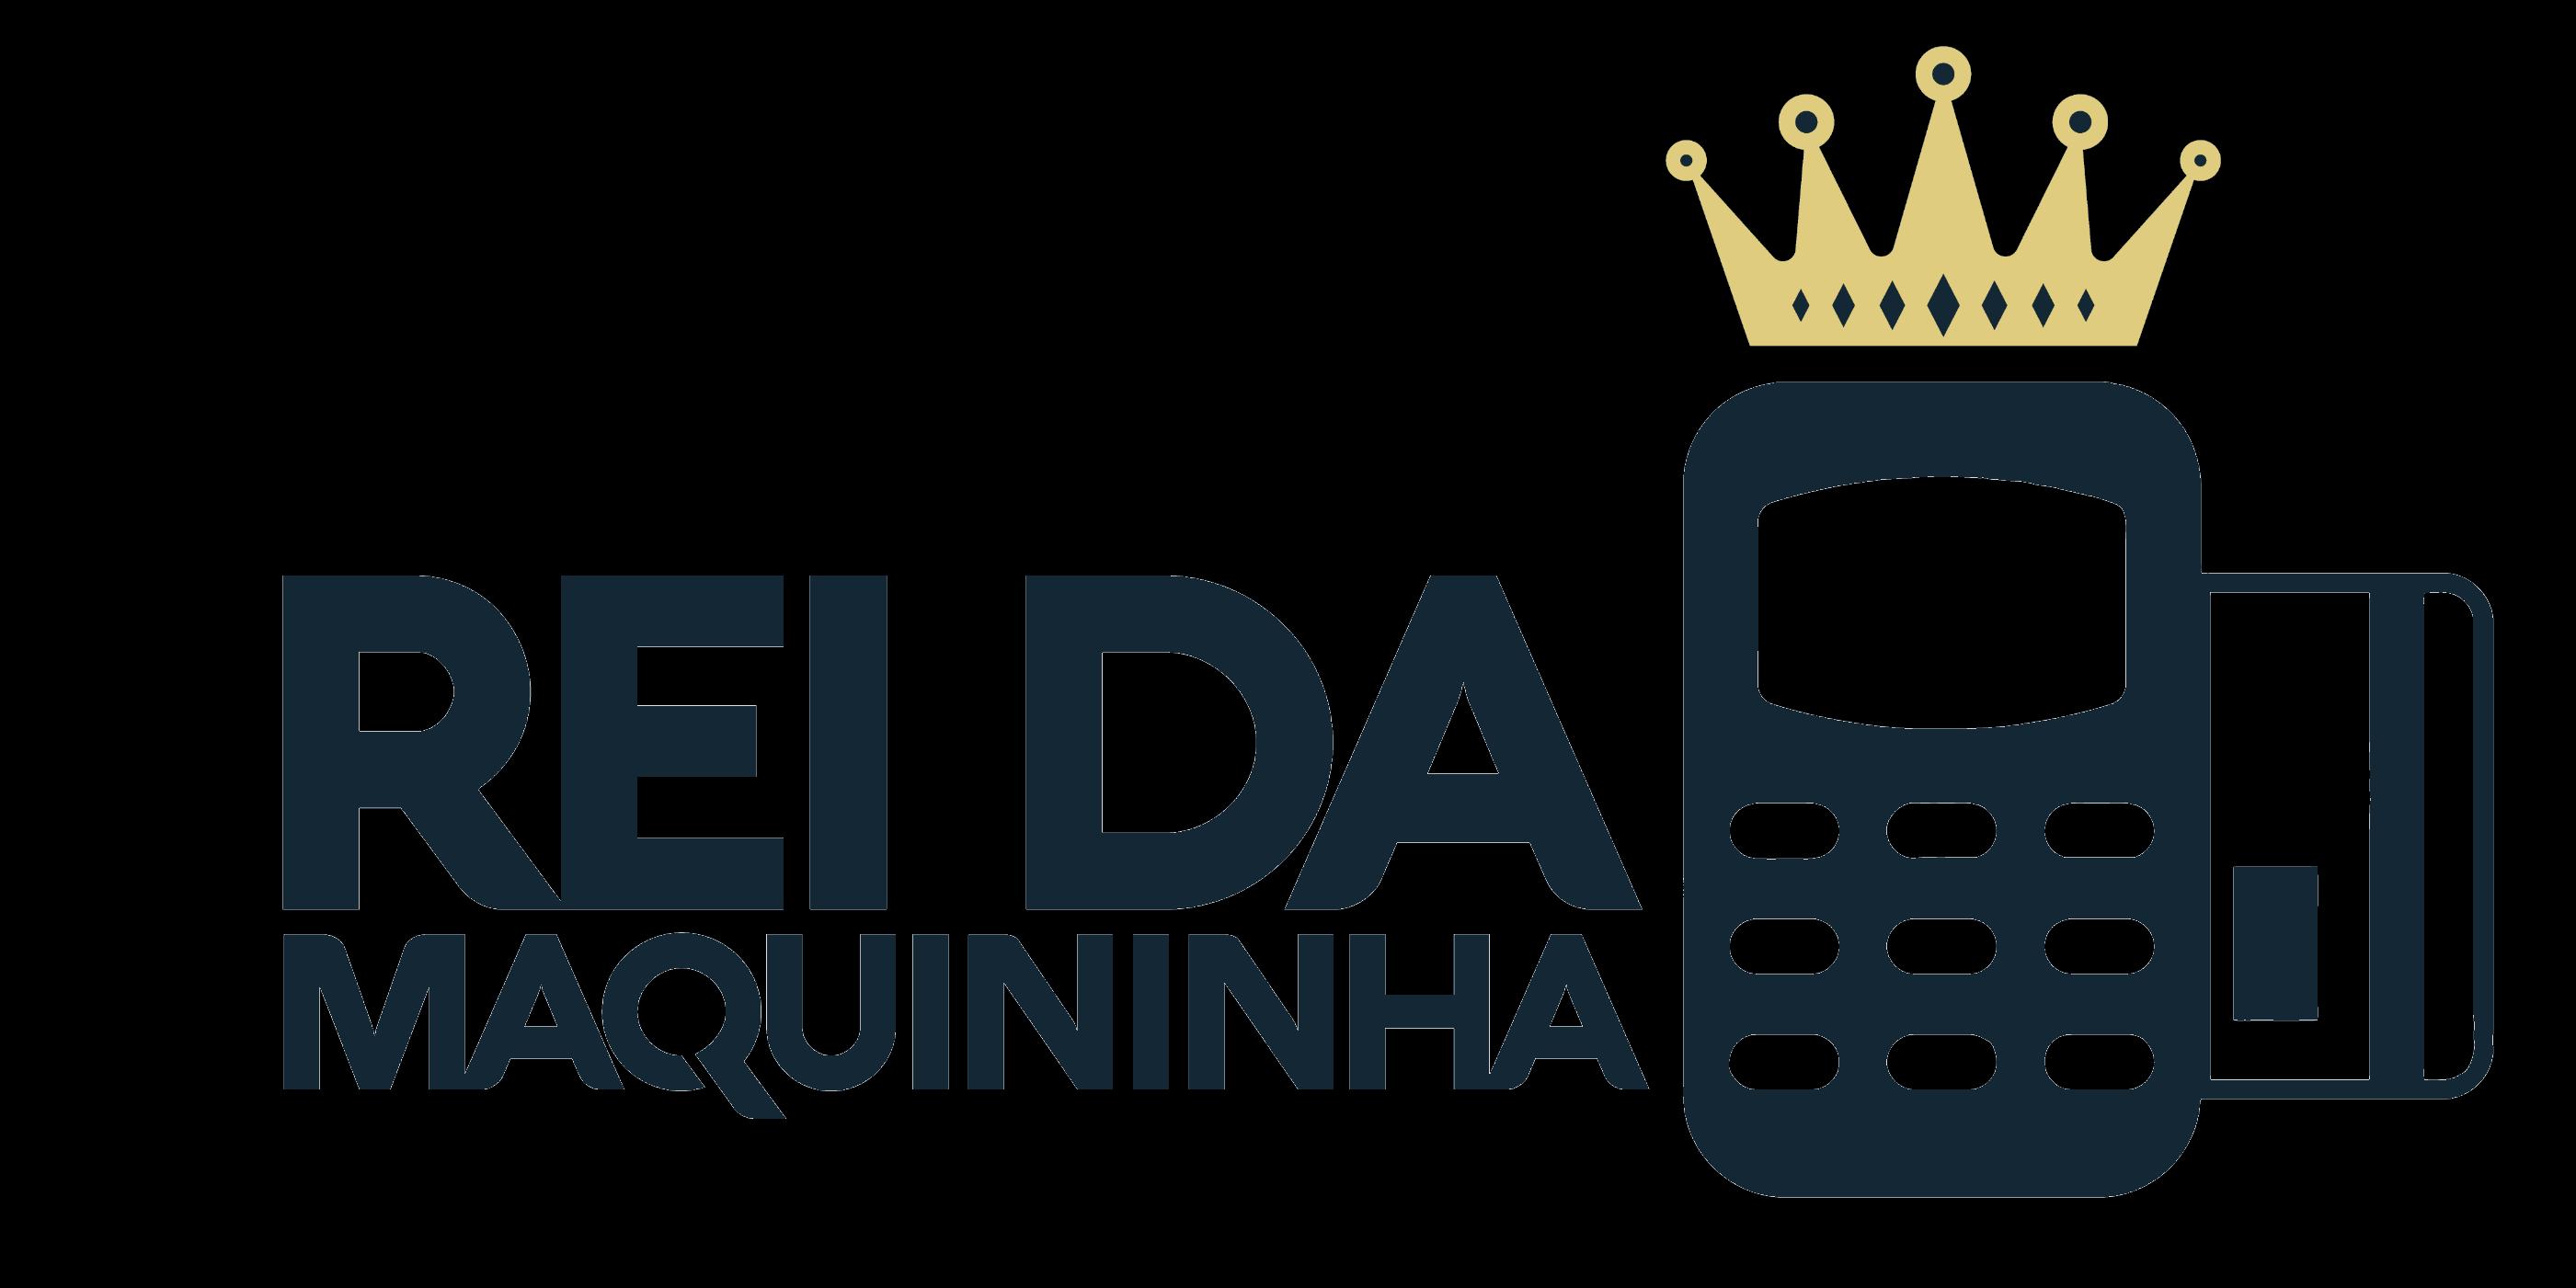 Pagseguro logo clipart image freeuse download Moderninha Smart PagSeguro. Tem Chip 4G, WiFi, Comprovantes ... image freeuse download